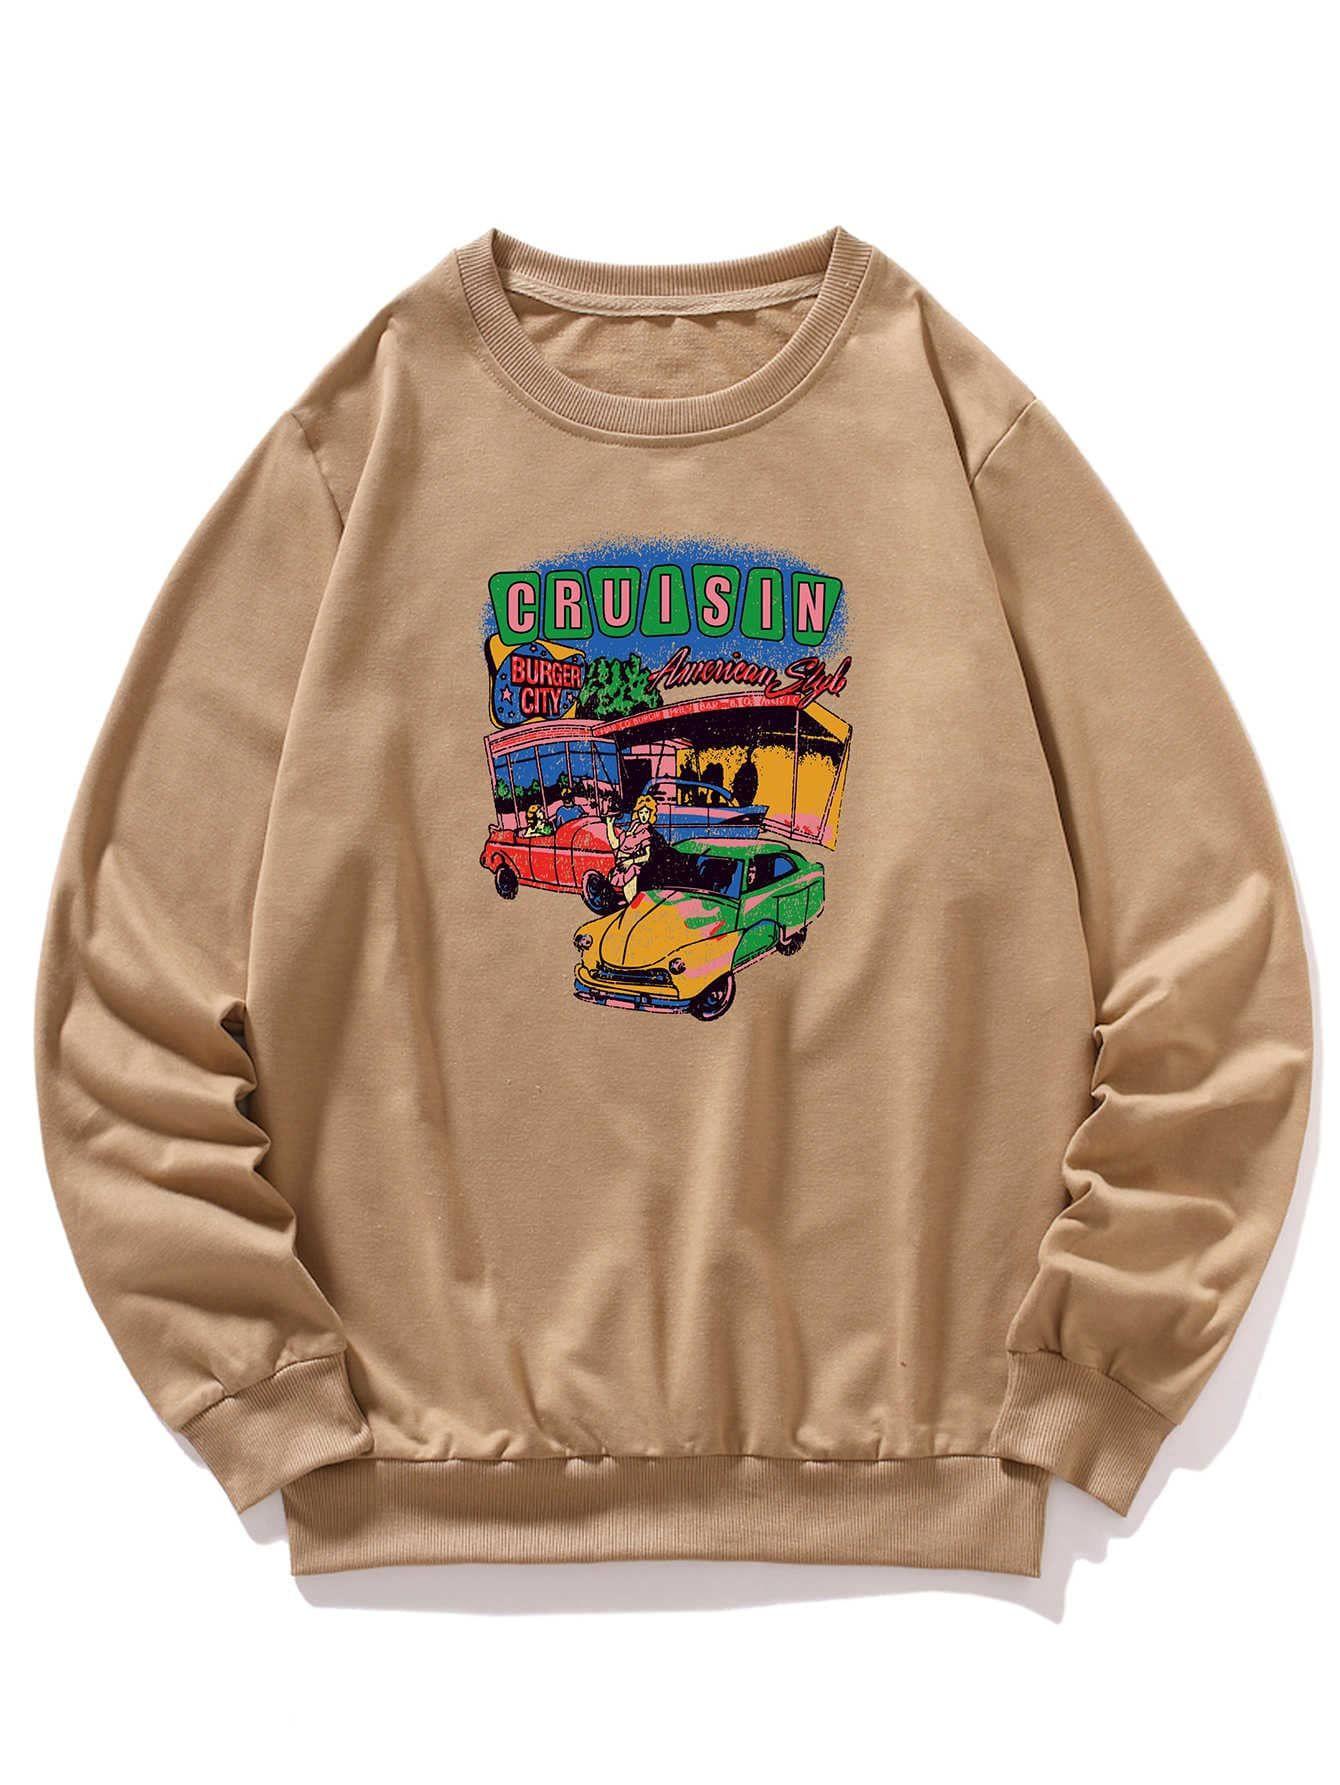 Men Car And Letter Graphic Sweatshirt Shein Usa Sweatshirts Graphic Sweatshirt Streetwear Men Outfits [ 1785 x 1340 Pixel ]